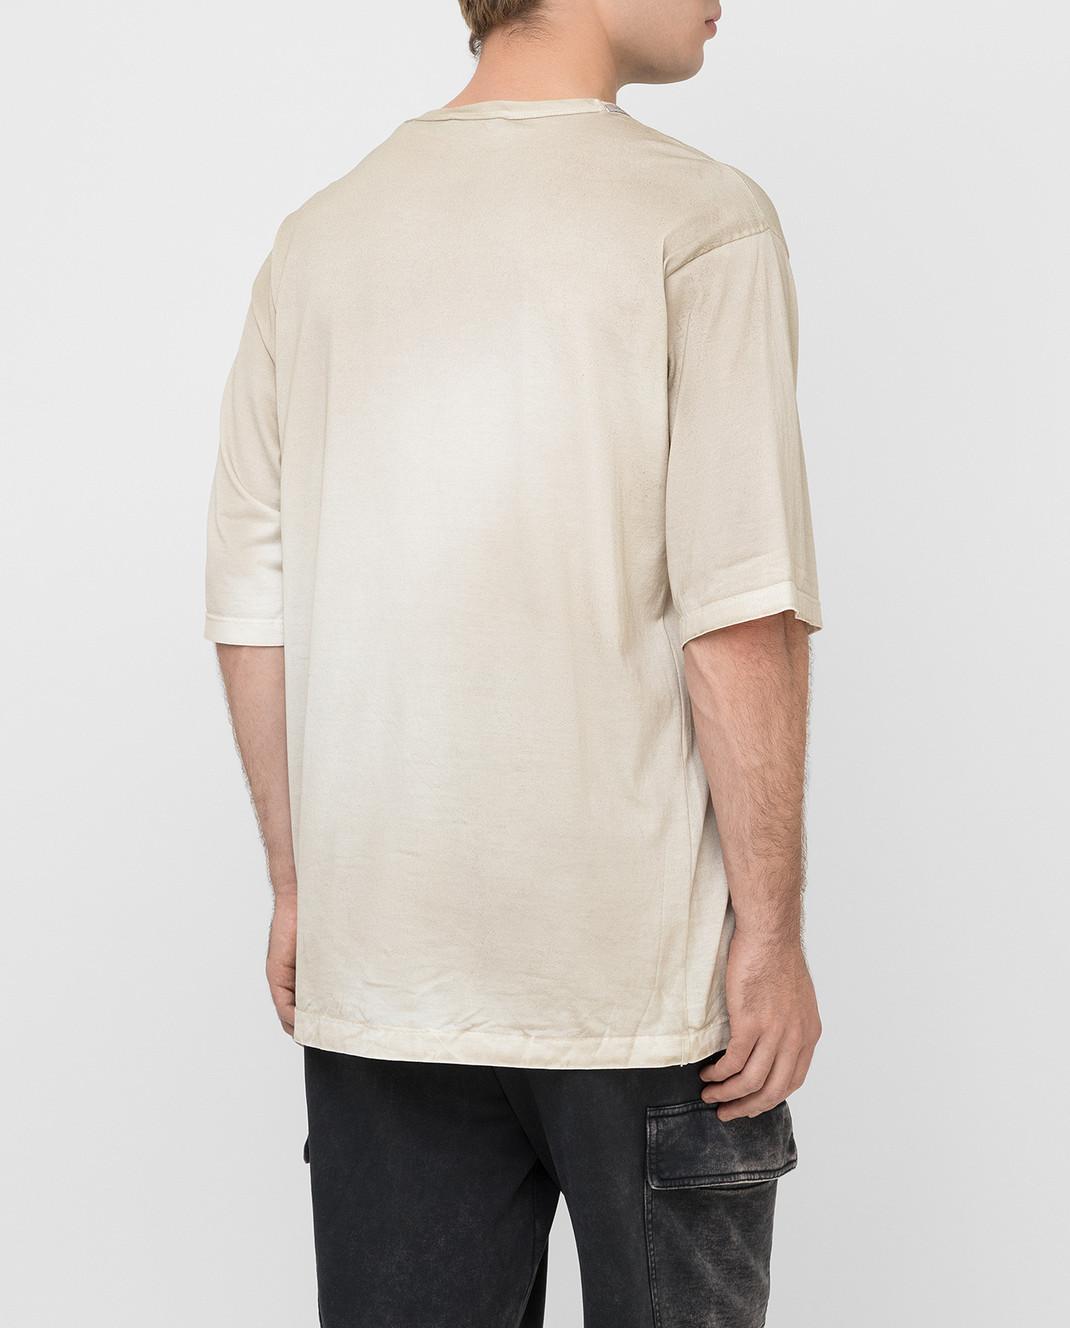 Dolce&Gabbana Бежевая футболка изображение 4